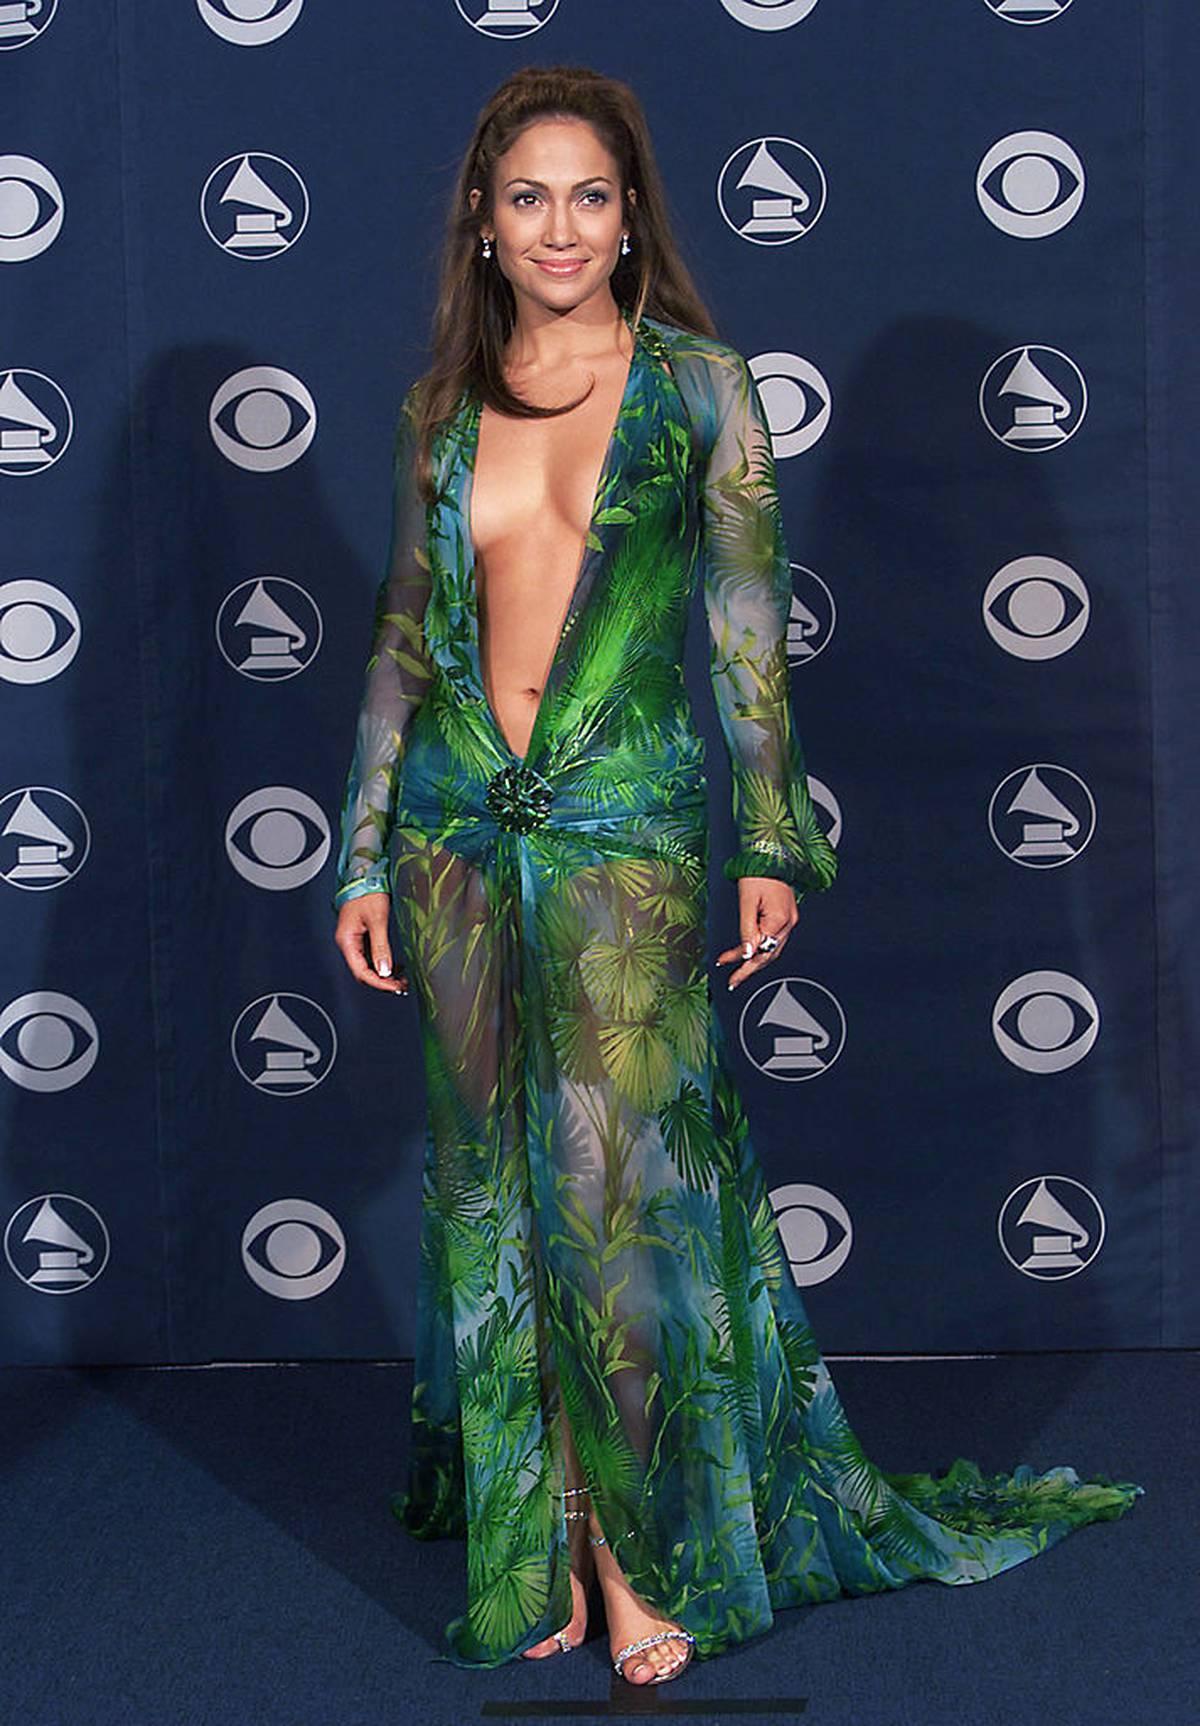 Jennifer Lopez's iconic Versace dress gets unusual revival